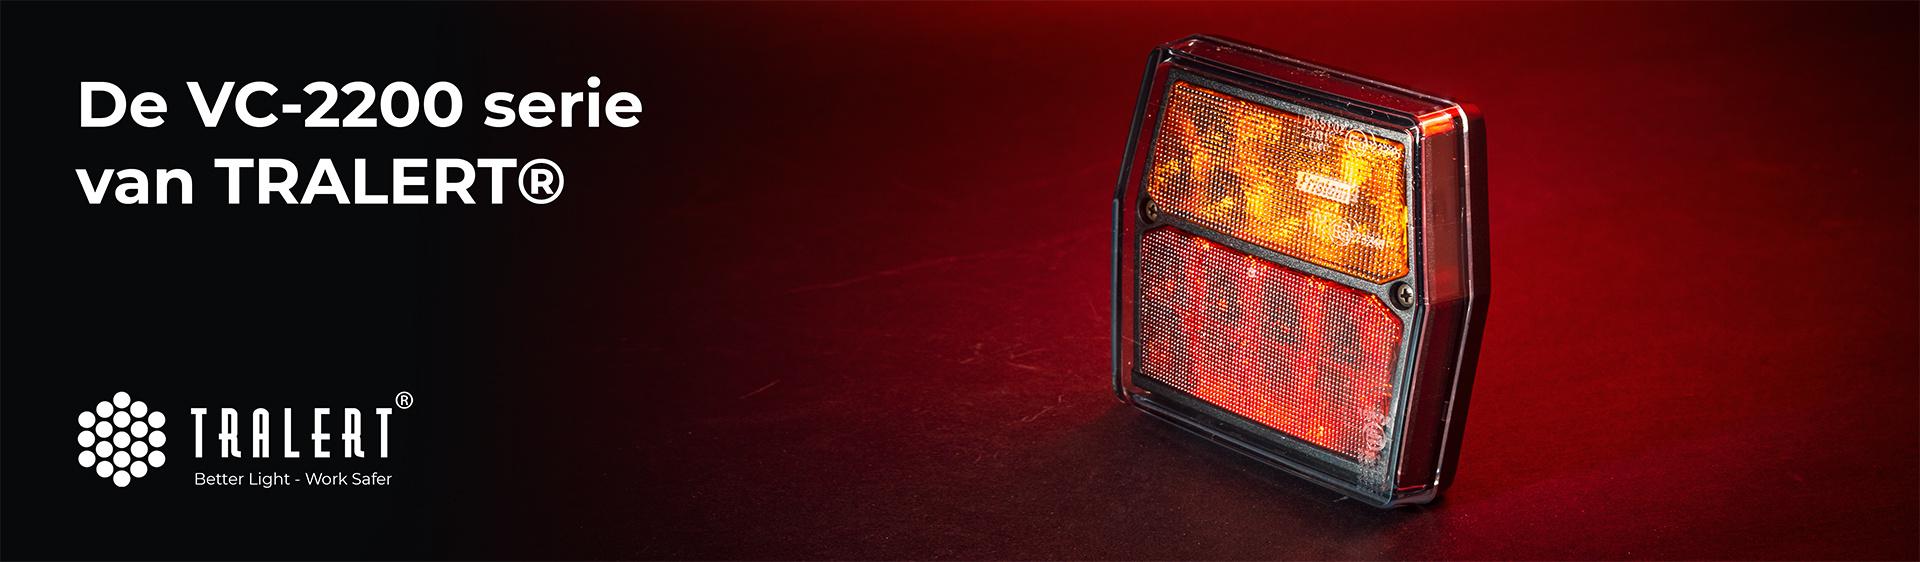 Tralert VC-2200 serie LED achterlichten